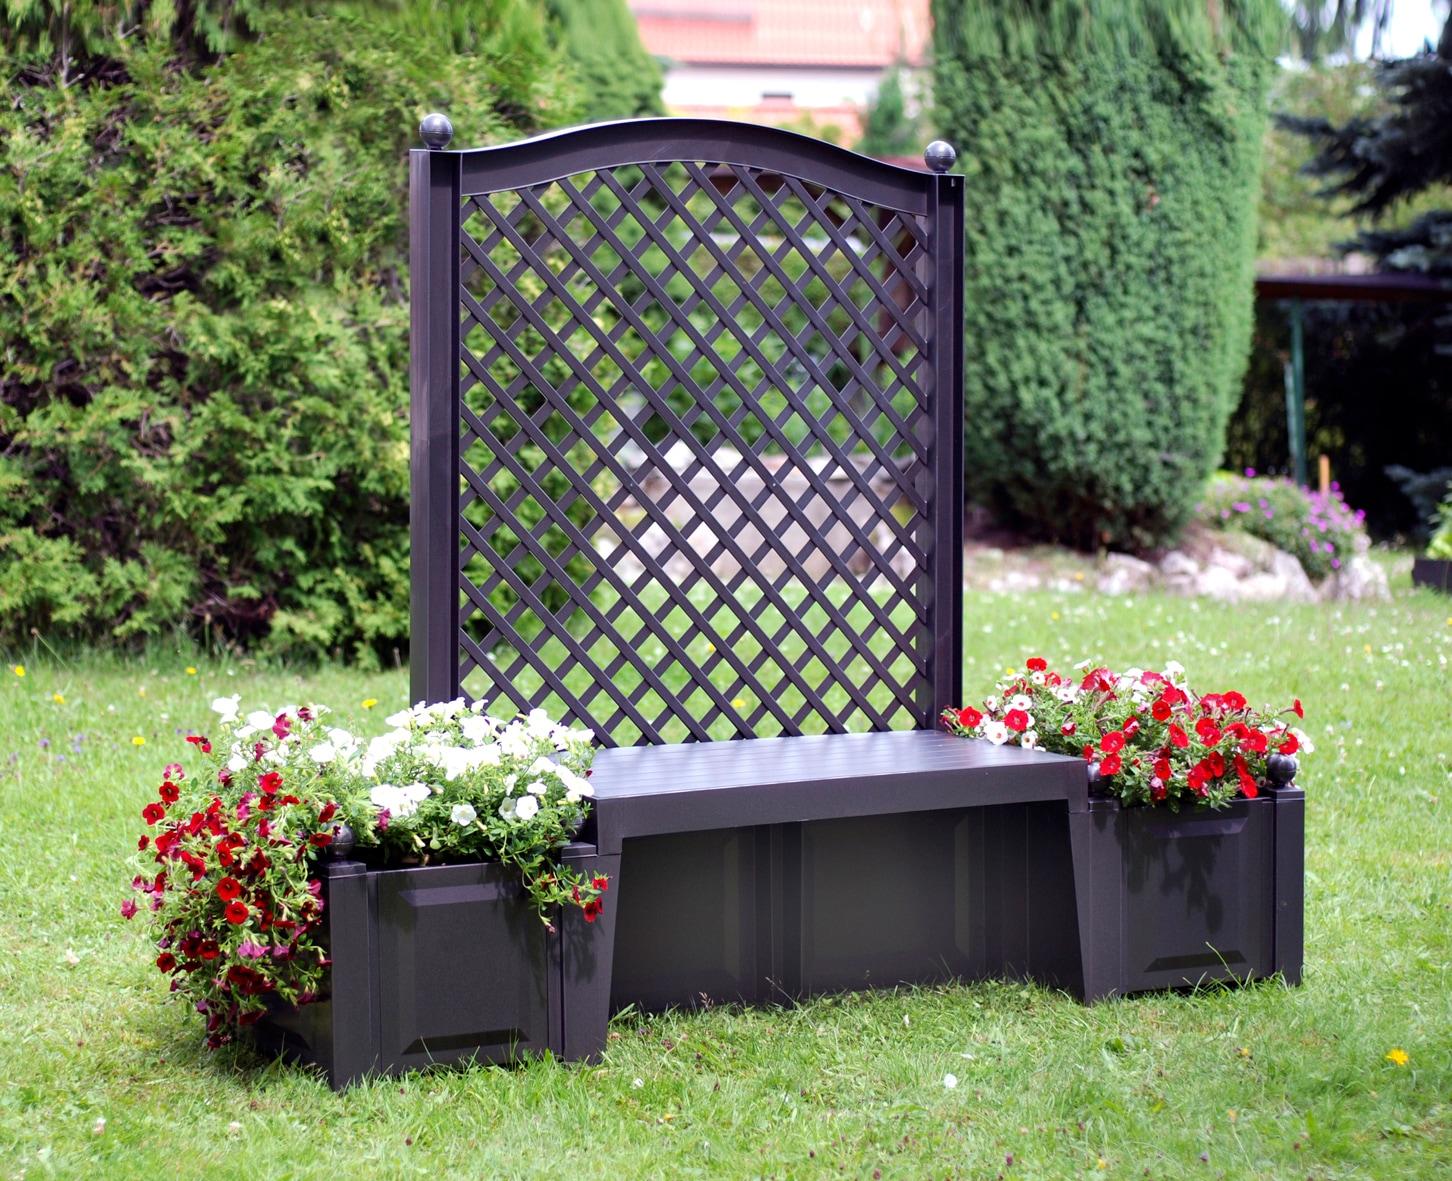 KHW Gartenbank Kopenhagen Kunststoff 174x49x139 cm anthrazit